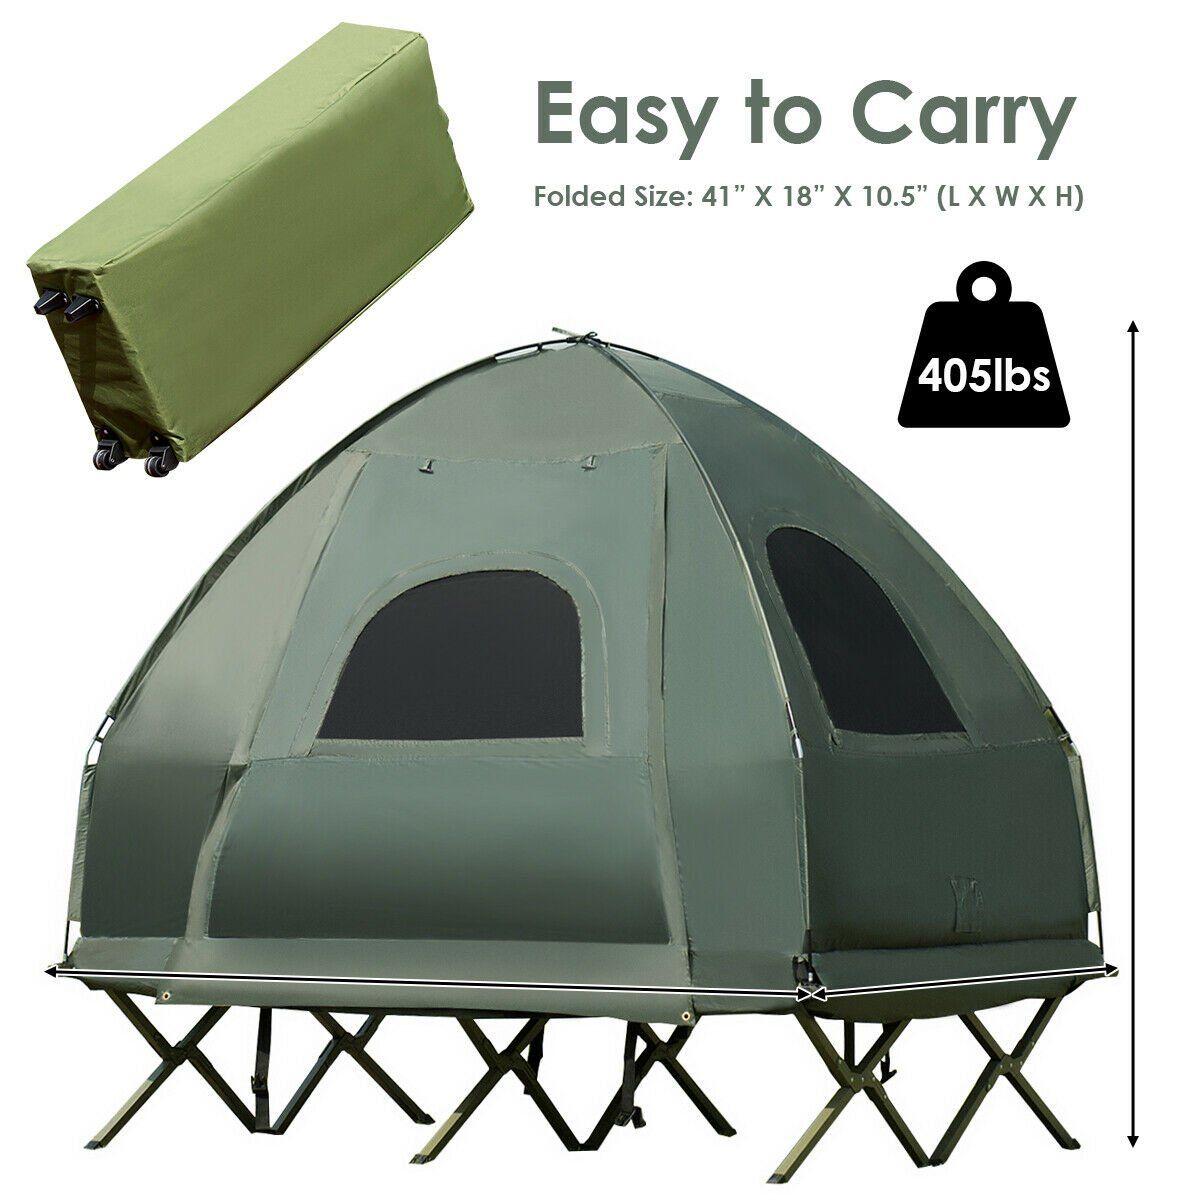 Gymax 2 Person Compact Portable Pop Up Tent Camping Cot W Air Mattress Sleeping Bag Walmart Com Pop Up Tent Pop Up Camping Tent Tent